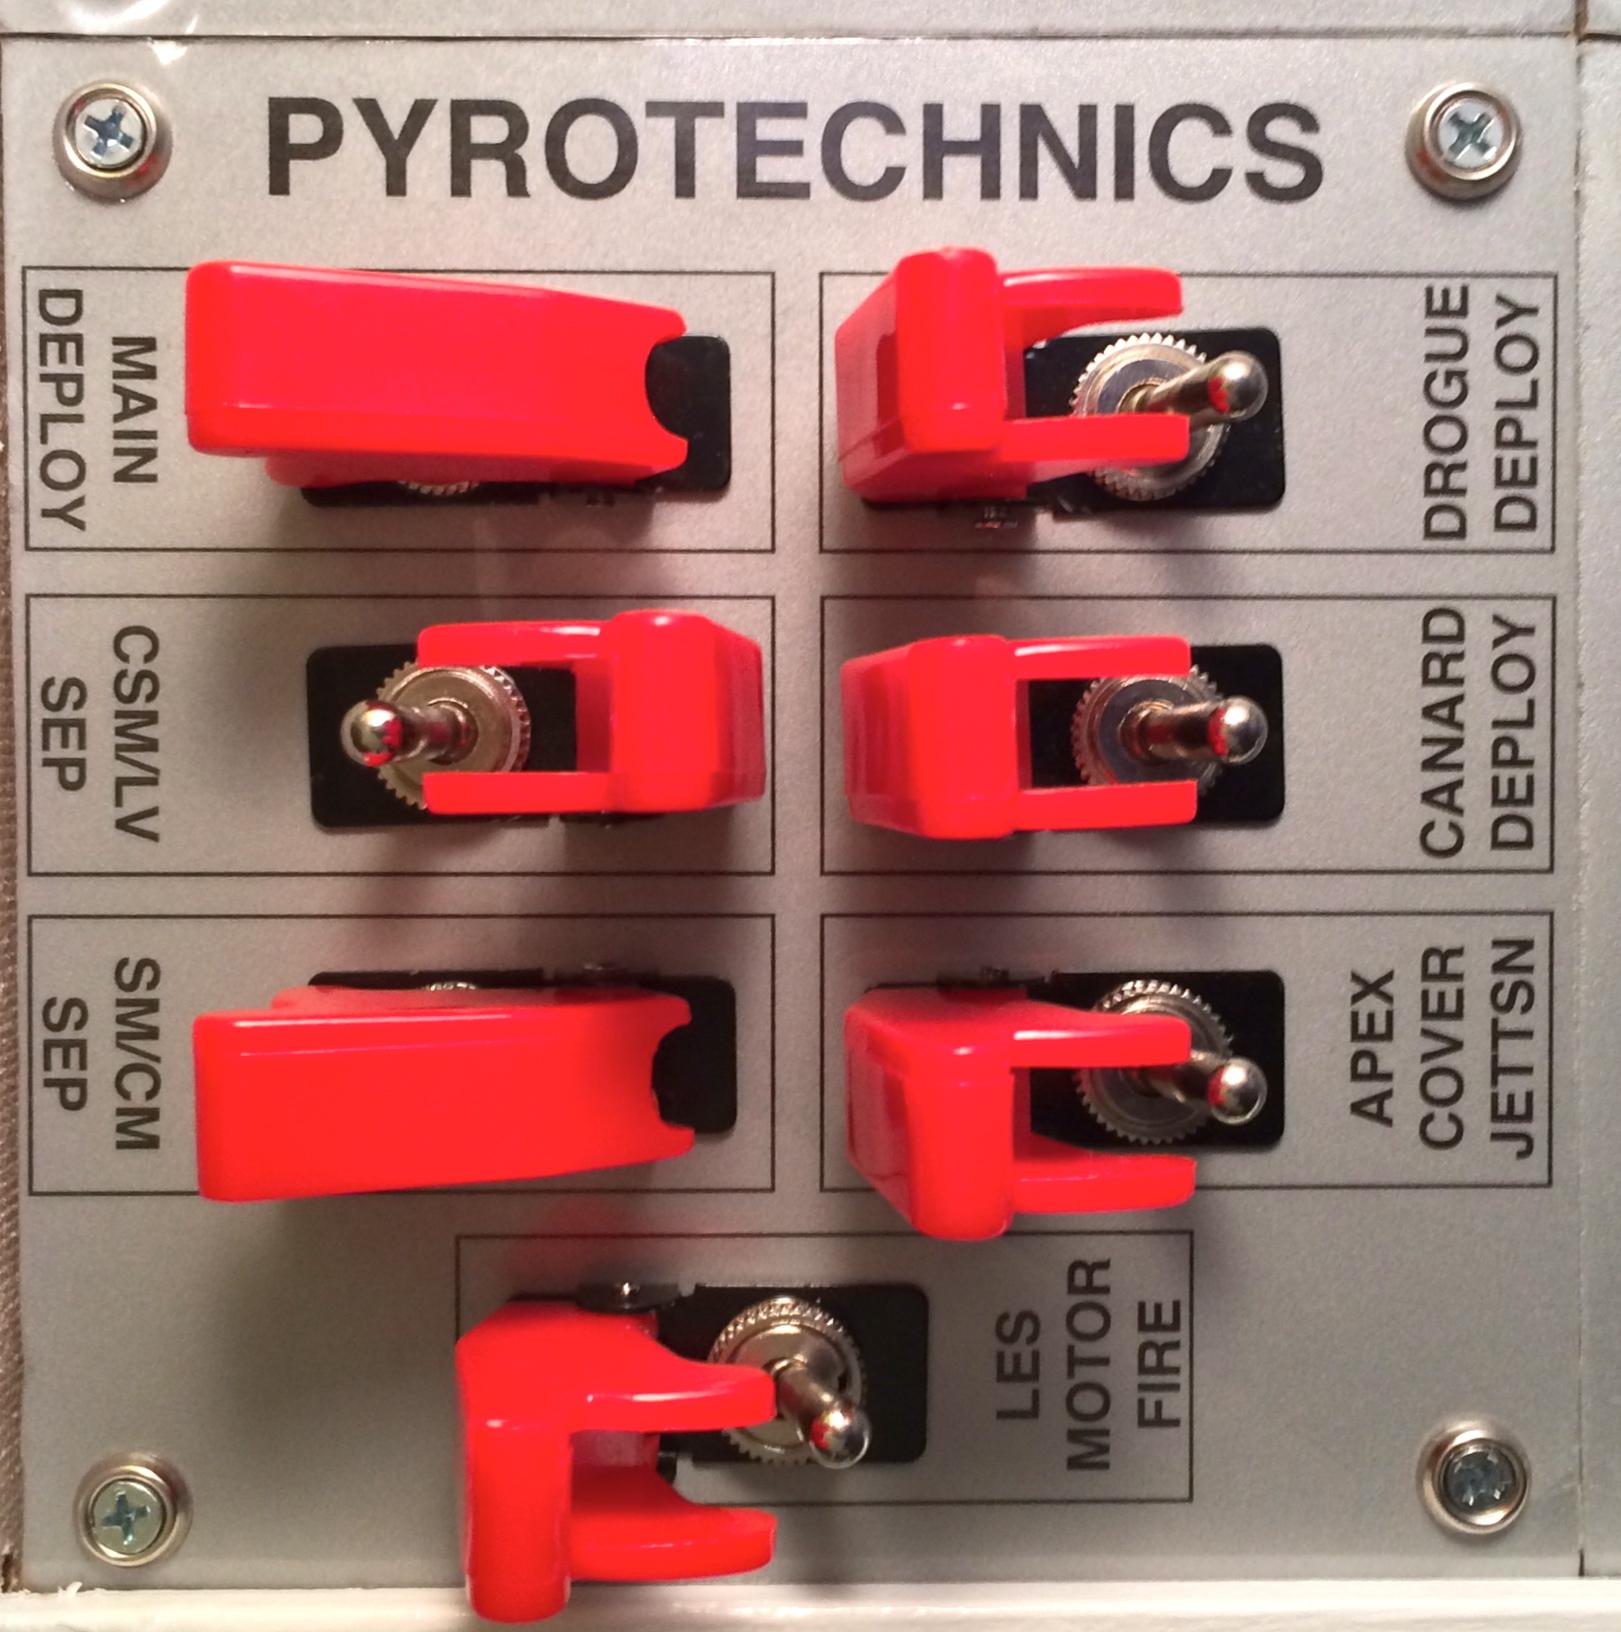 Spaceship Pyrotechnics